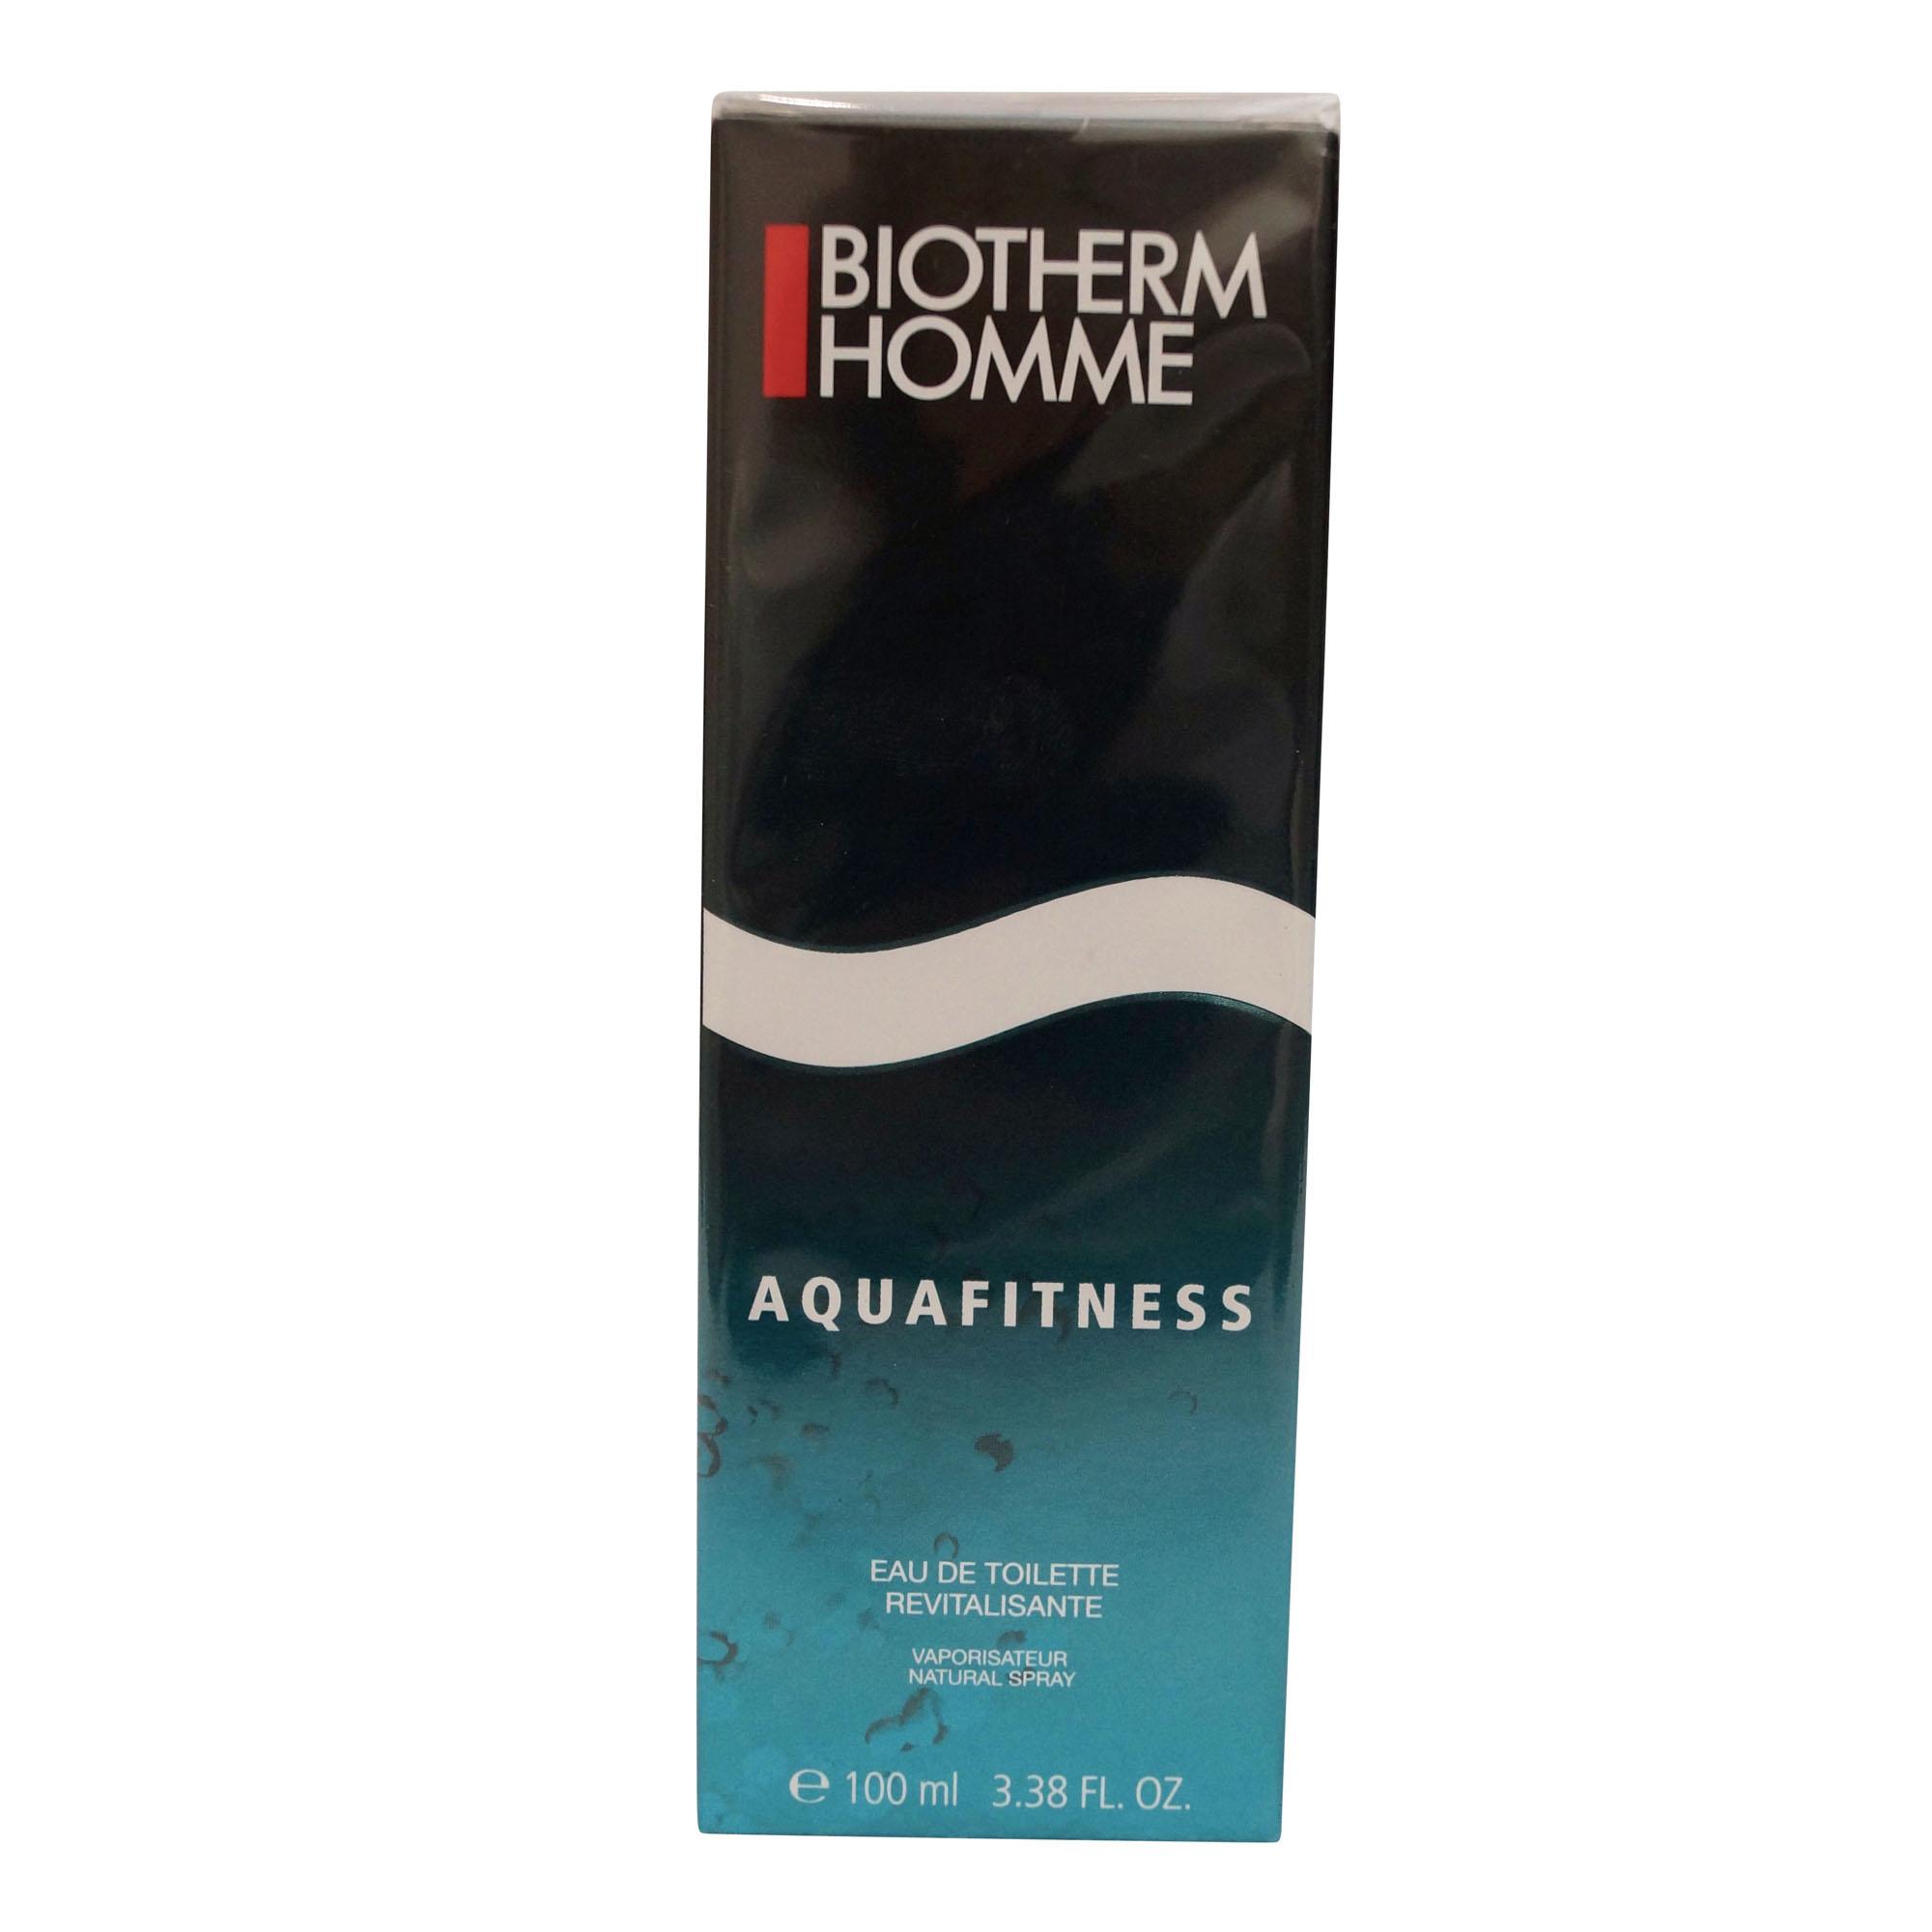 Biotherm Aquafitness EDT for Men, 3.38 Oz